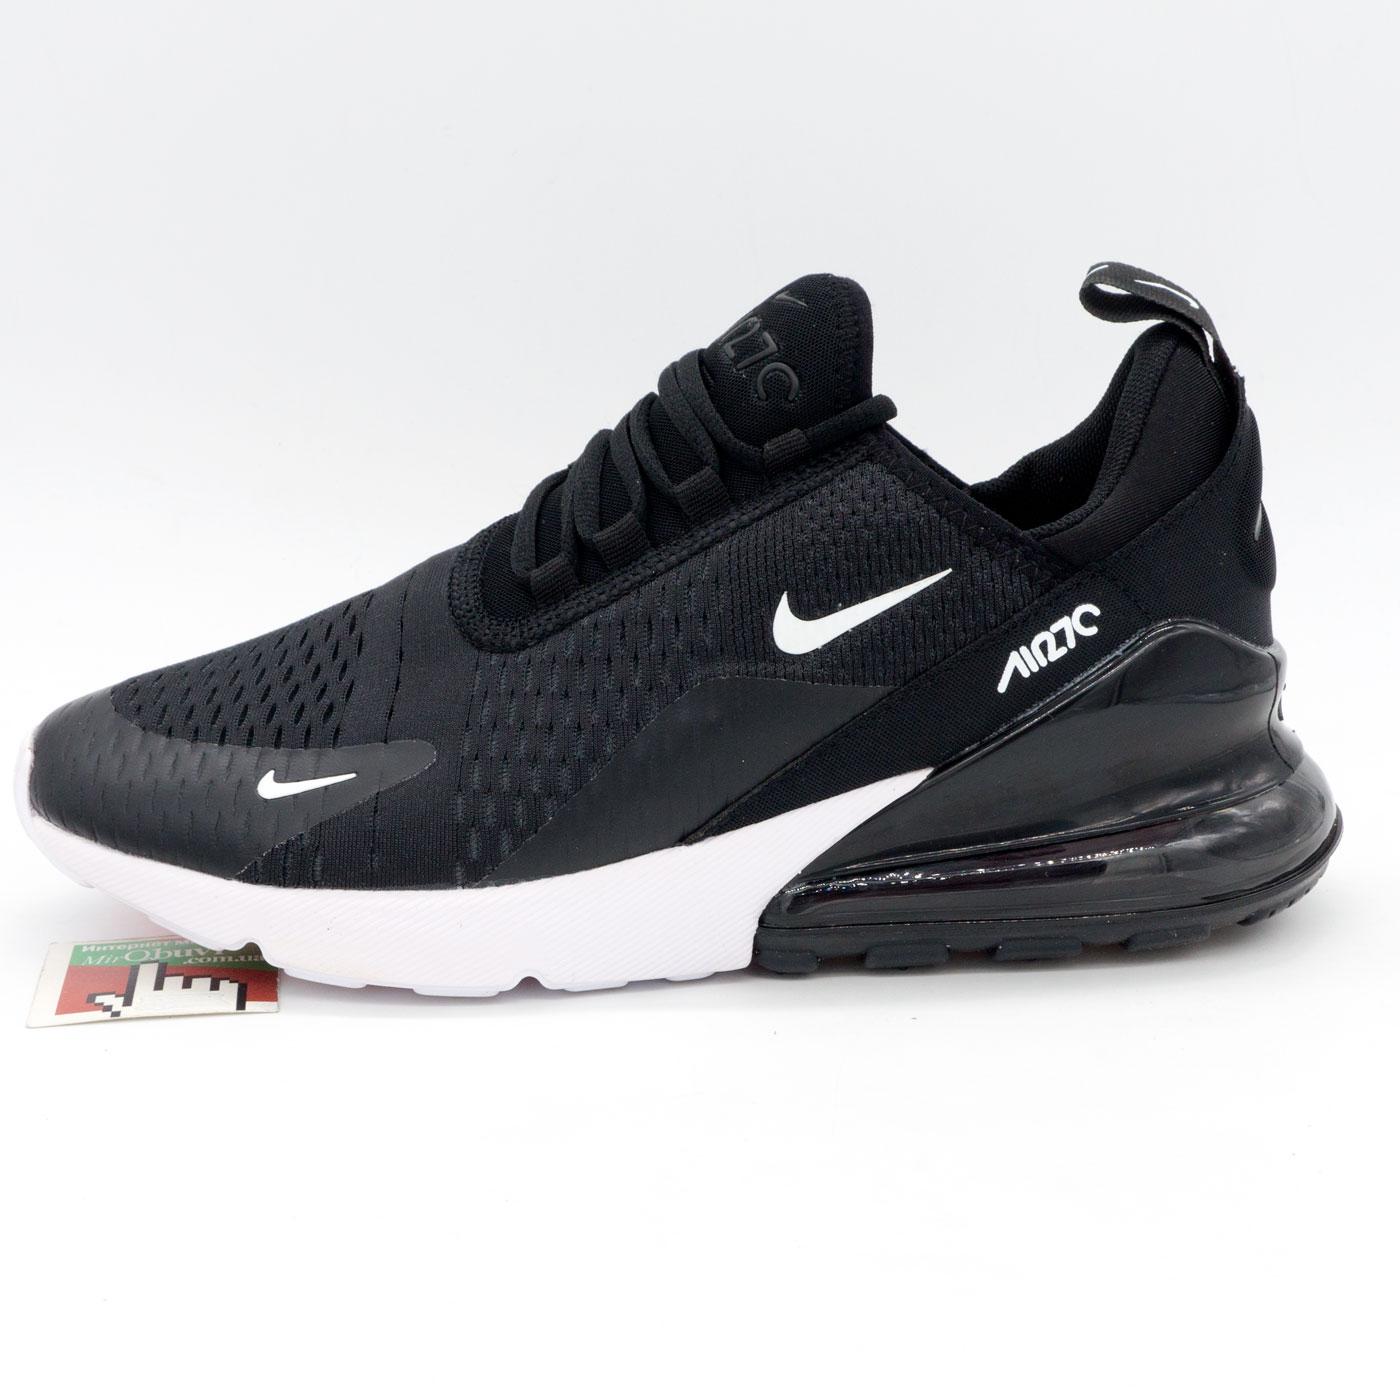 фото front Кроссовки Nike Air Max 270 Flyknit черно белые. Топ качество! front